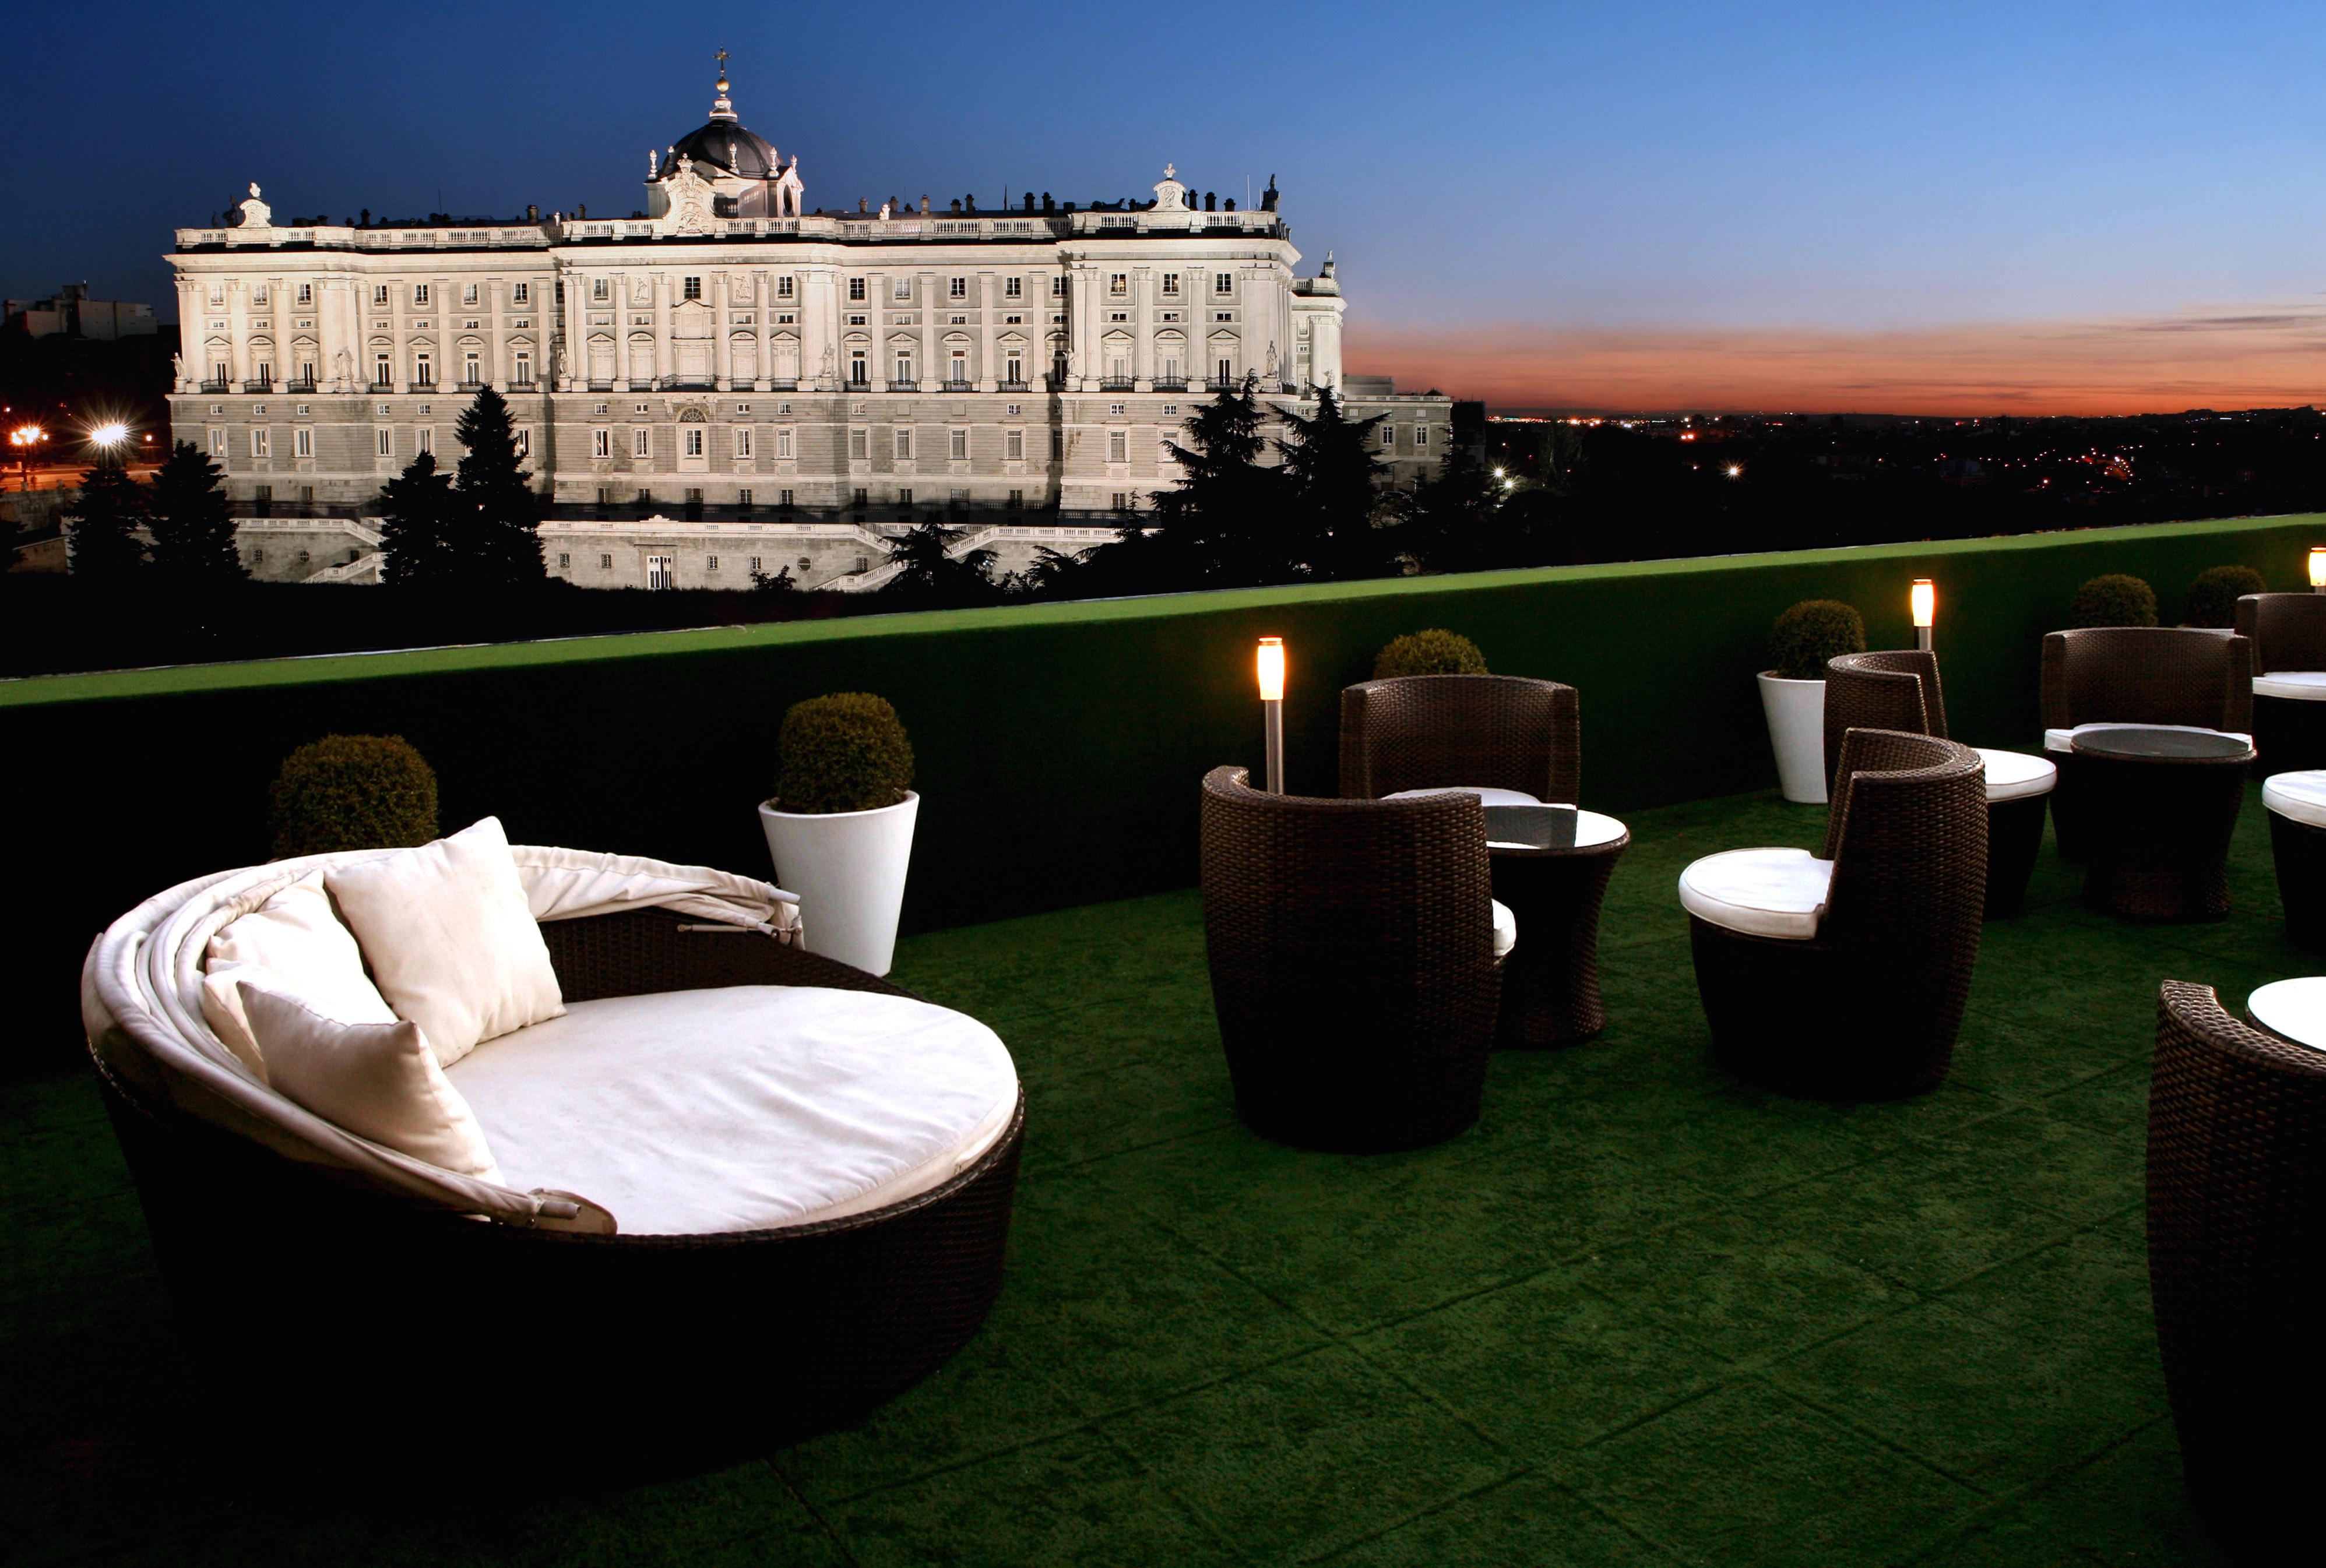 Las mejores terrazas de madrid chic and cheap madrid for Terrazas nocturnas madrid